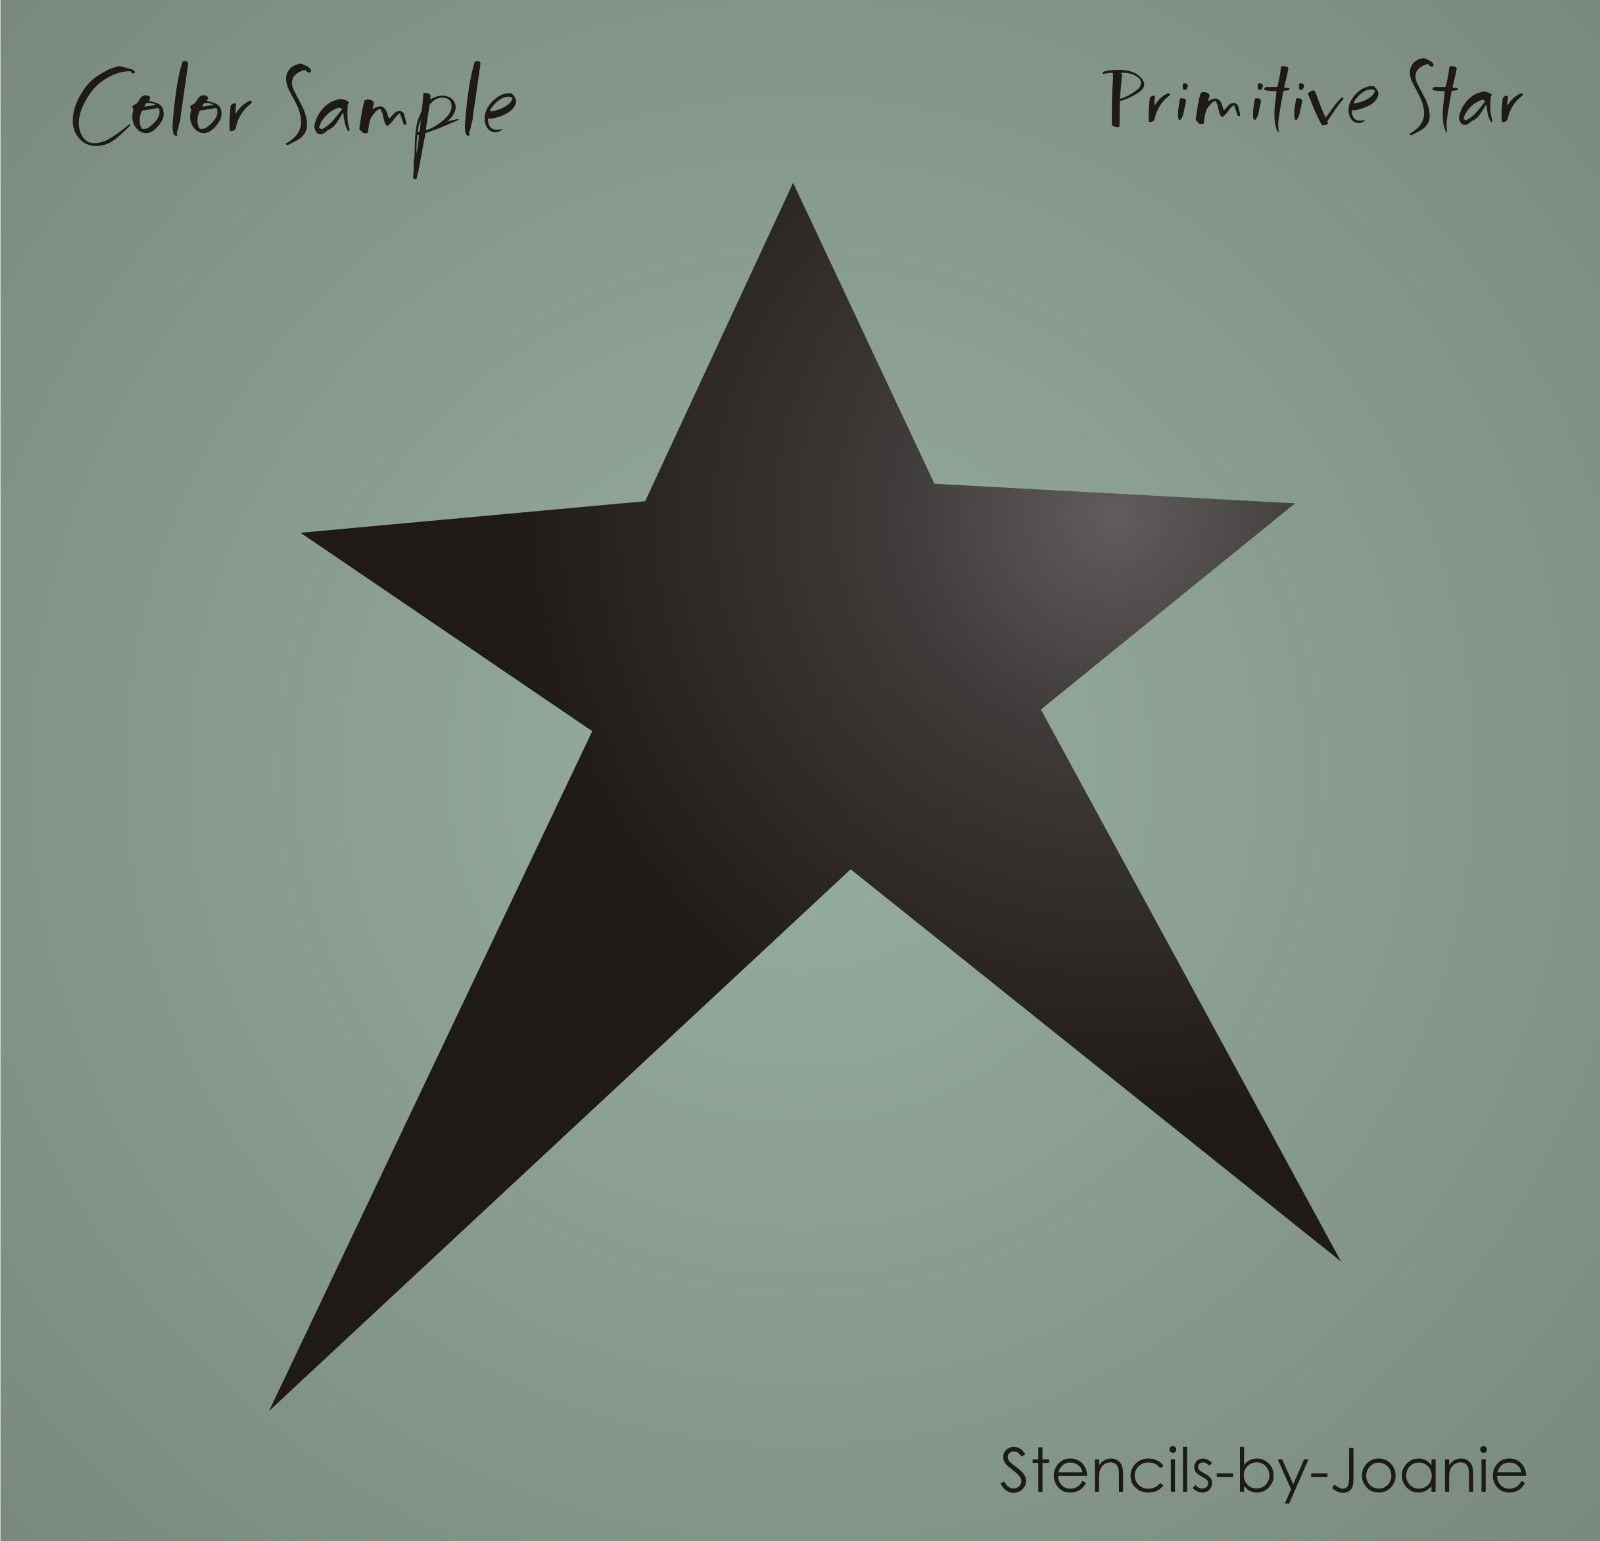 Details About Joanie Patriotic Stencil 1776 Stars